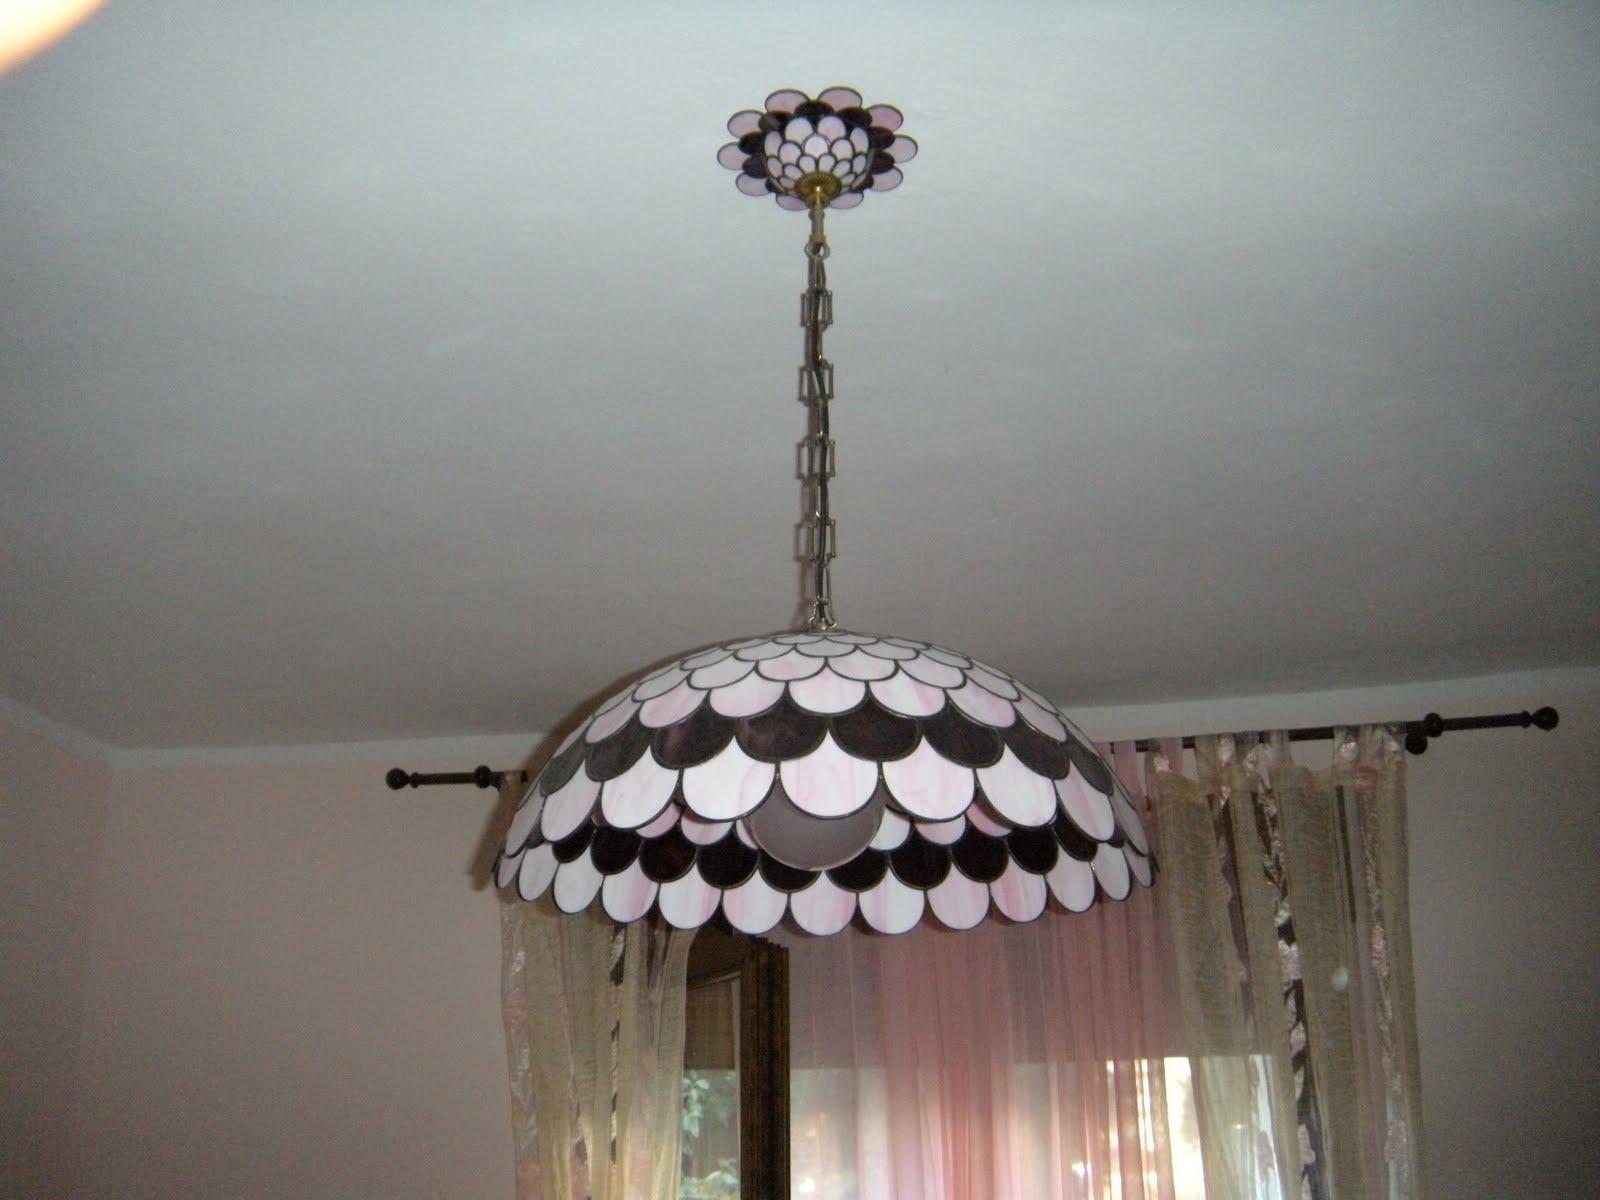 Rosone Soffitto Prezzo: Rosone soffitto prezzo produciamo lampadari applique lampade.